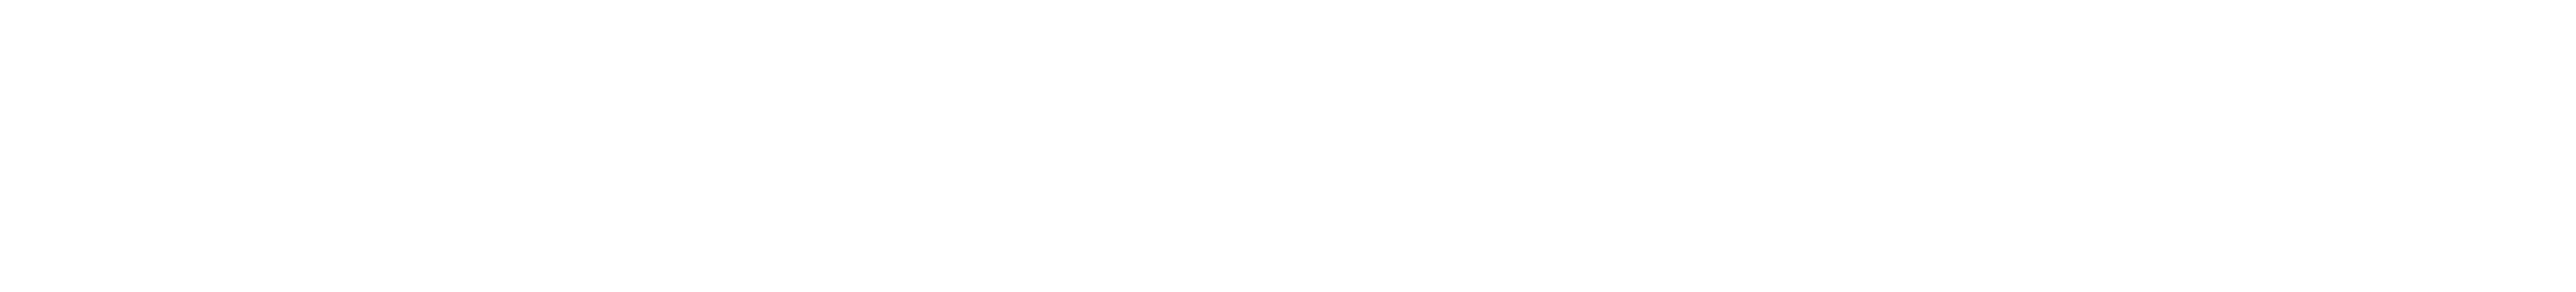 Goulburn Post